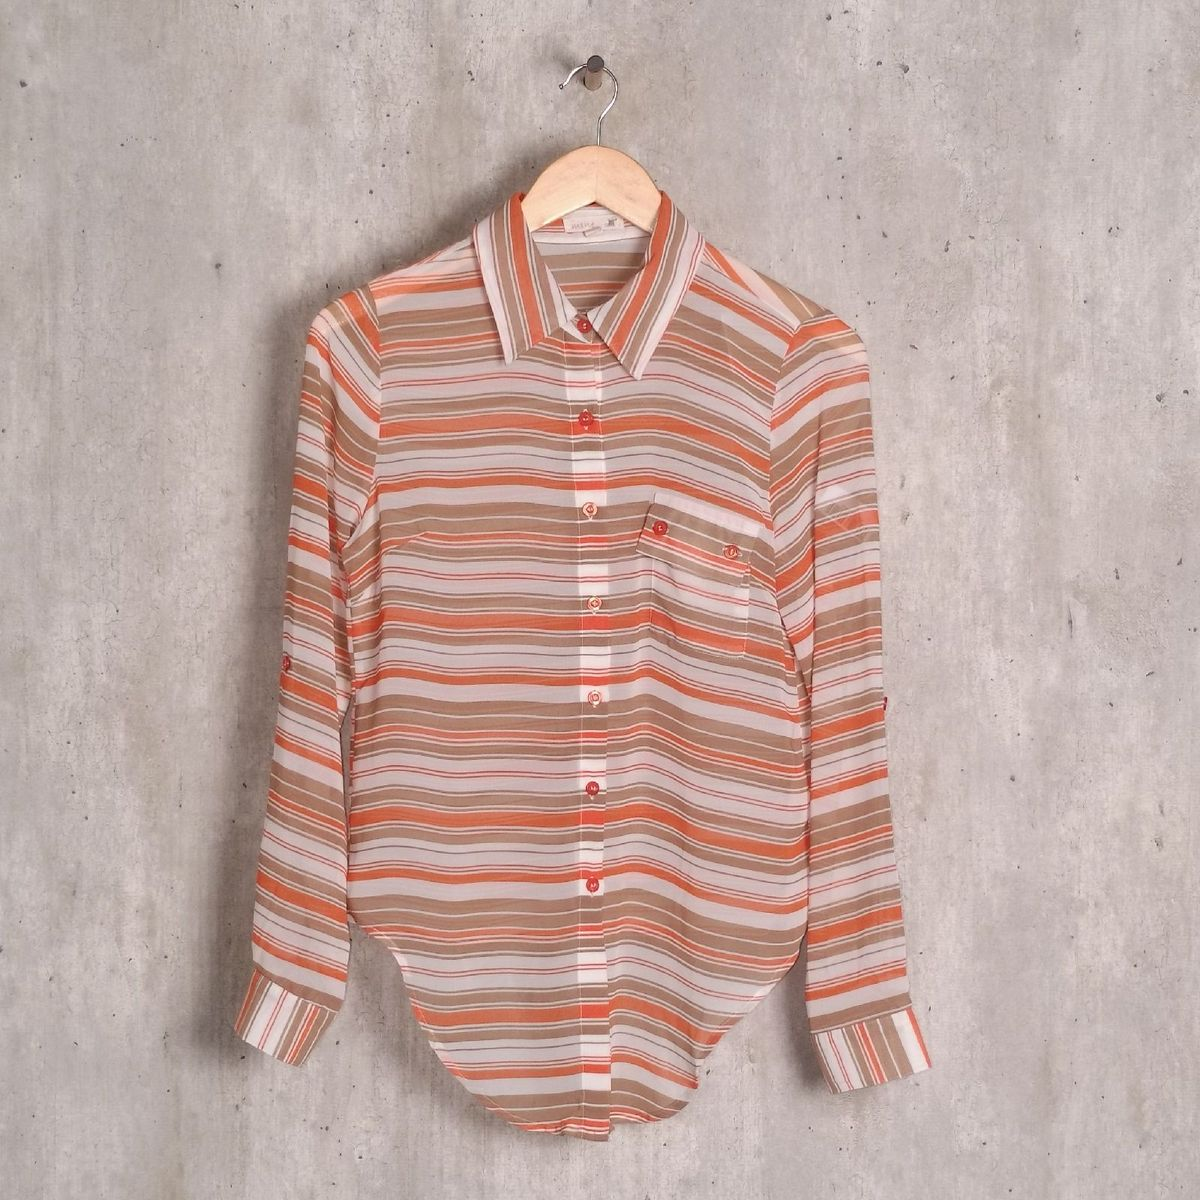 camisa multicolor listrada - camisas mine